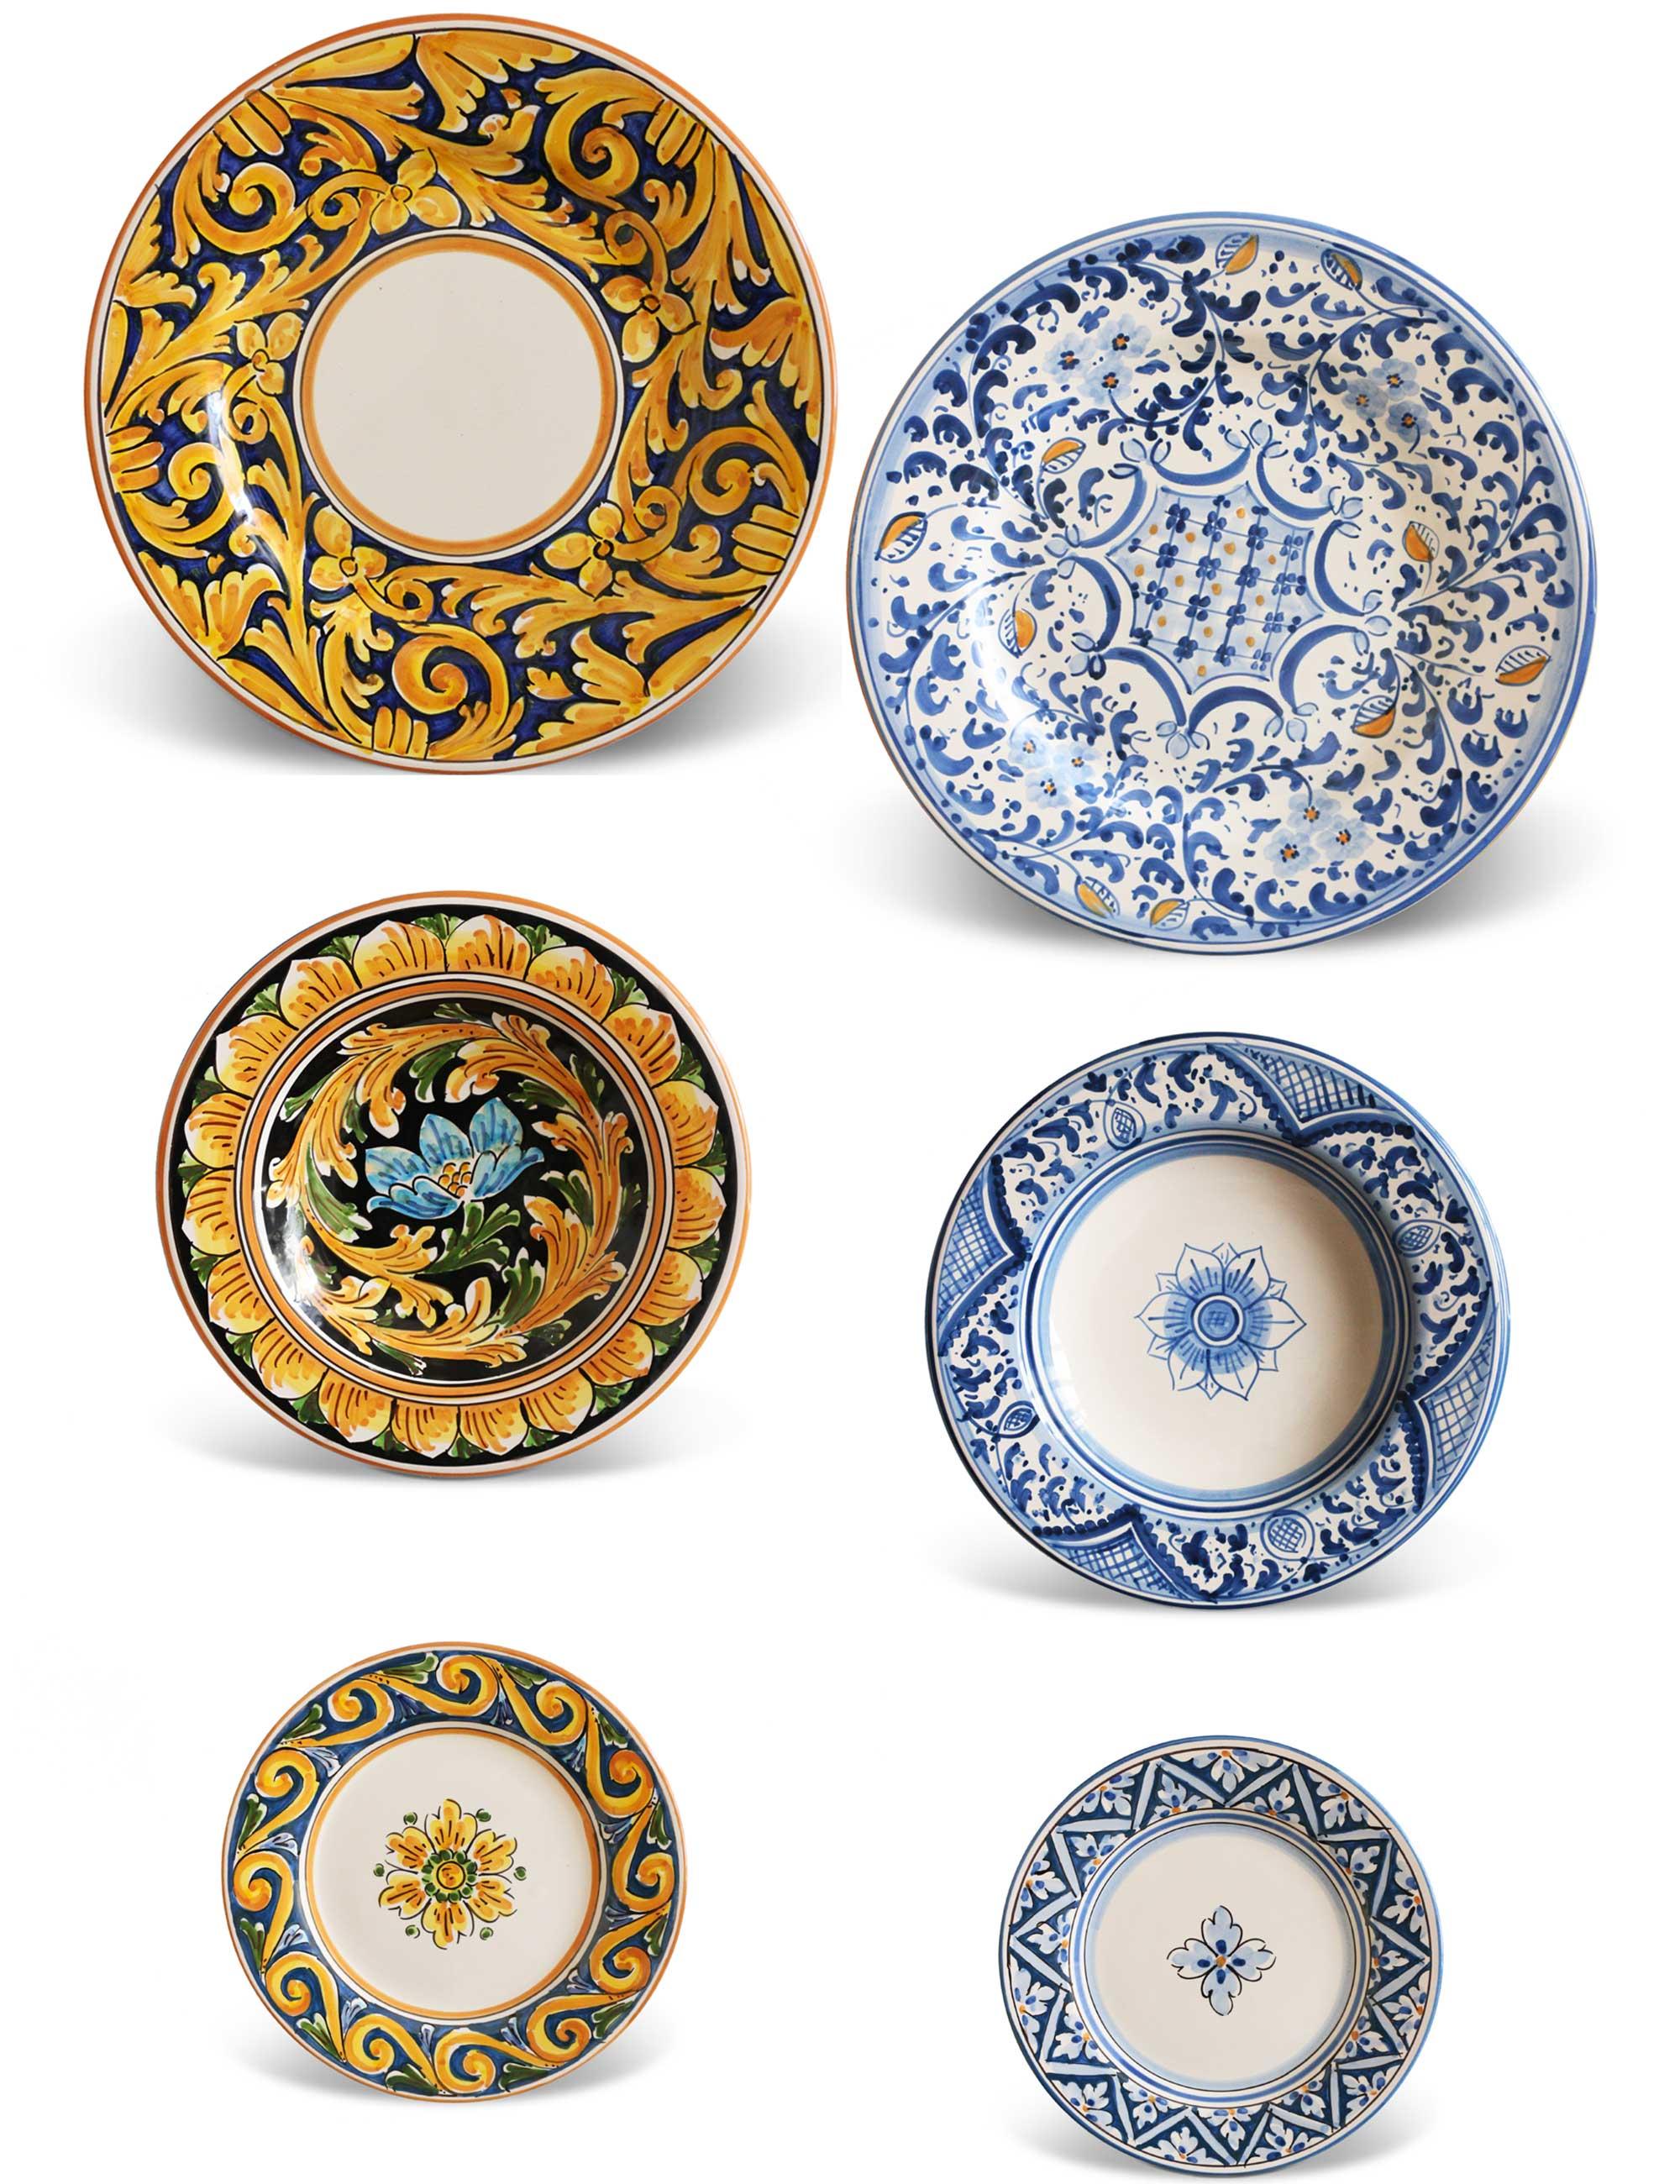 piatti siciliani decorati set due persone Ventu